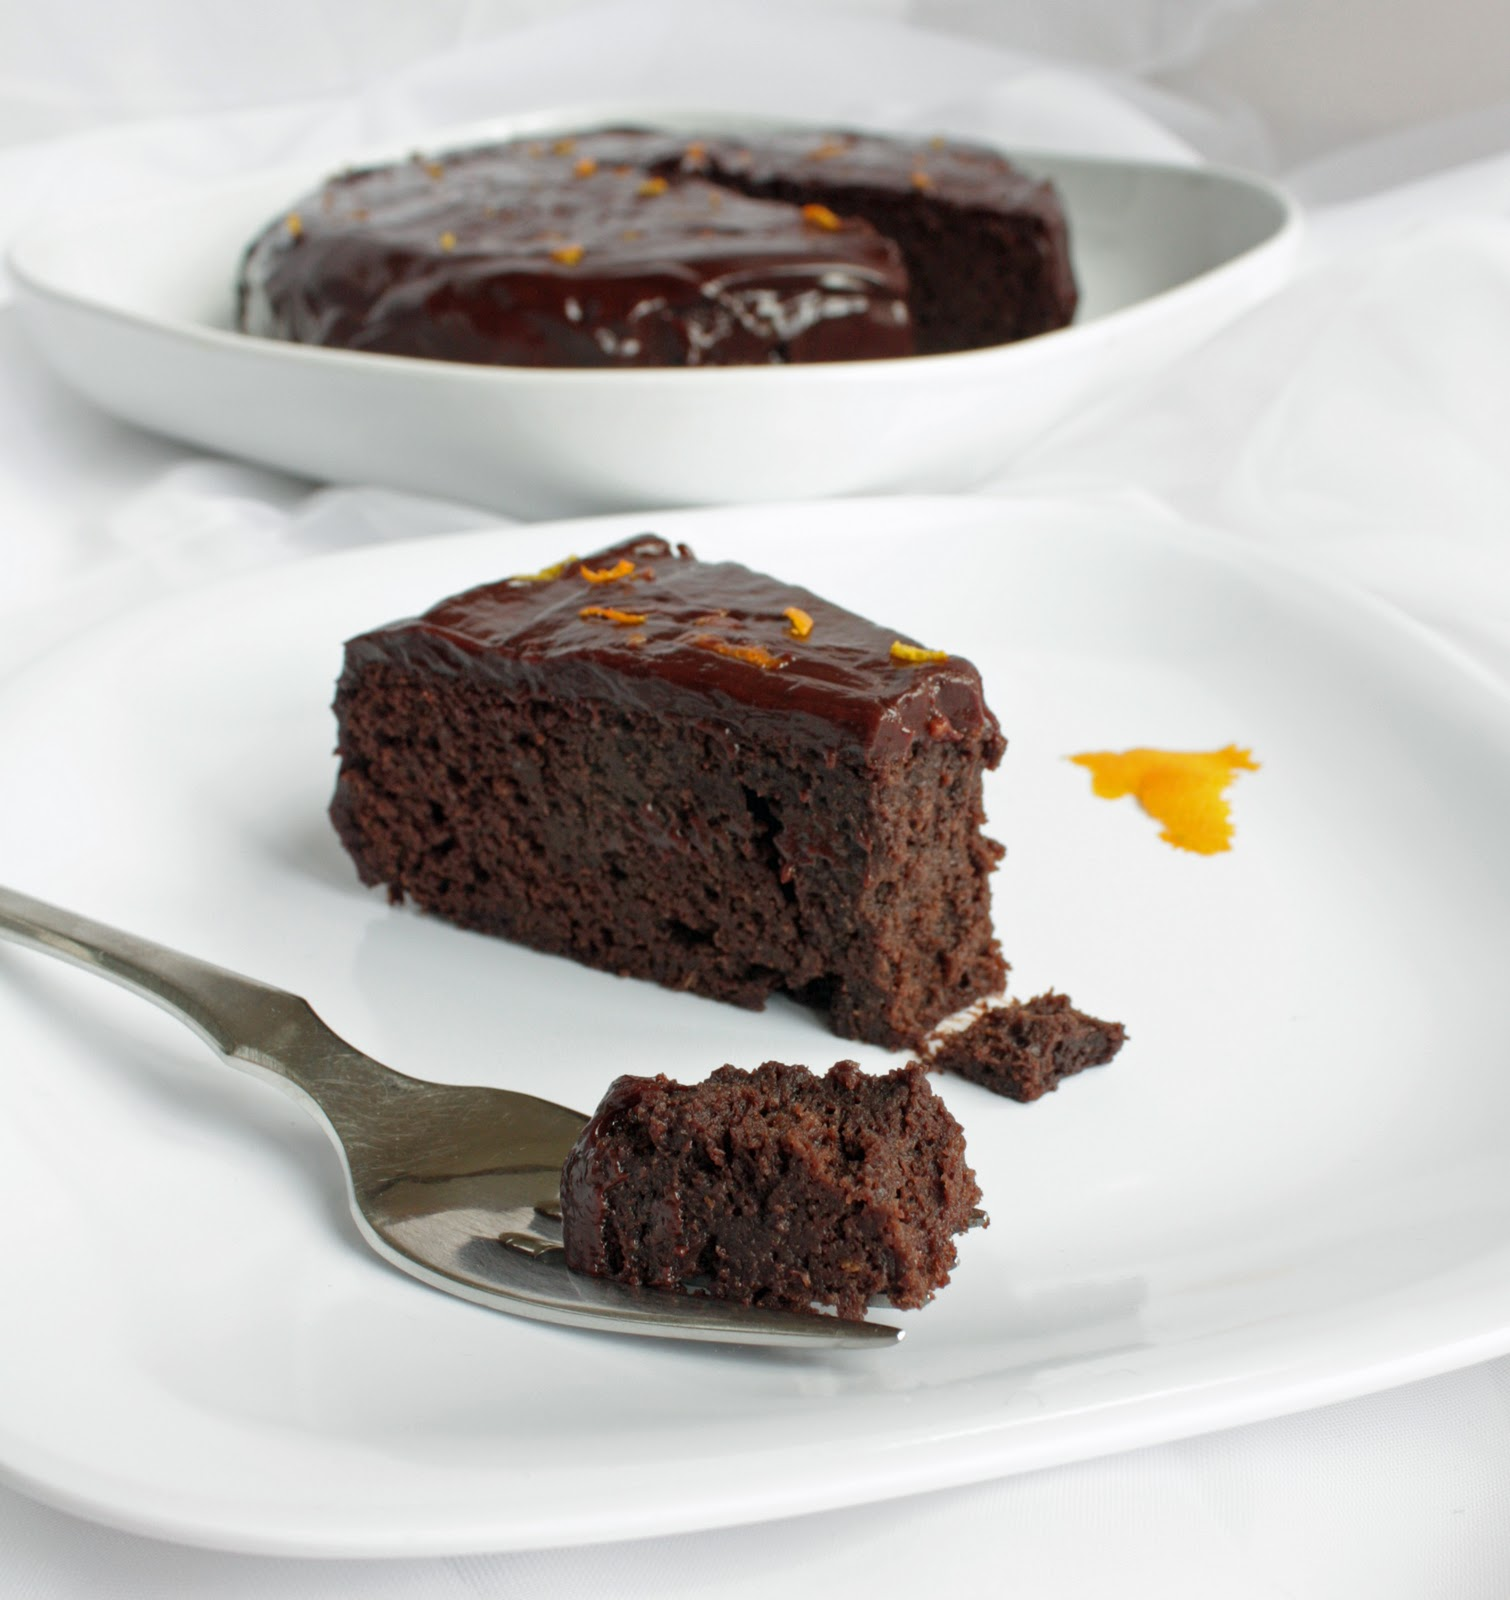 Chocolate Orange Garbanzo Bean Cake